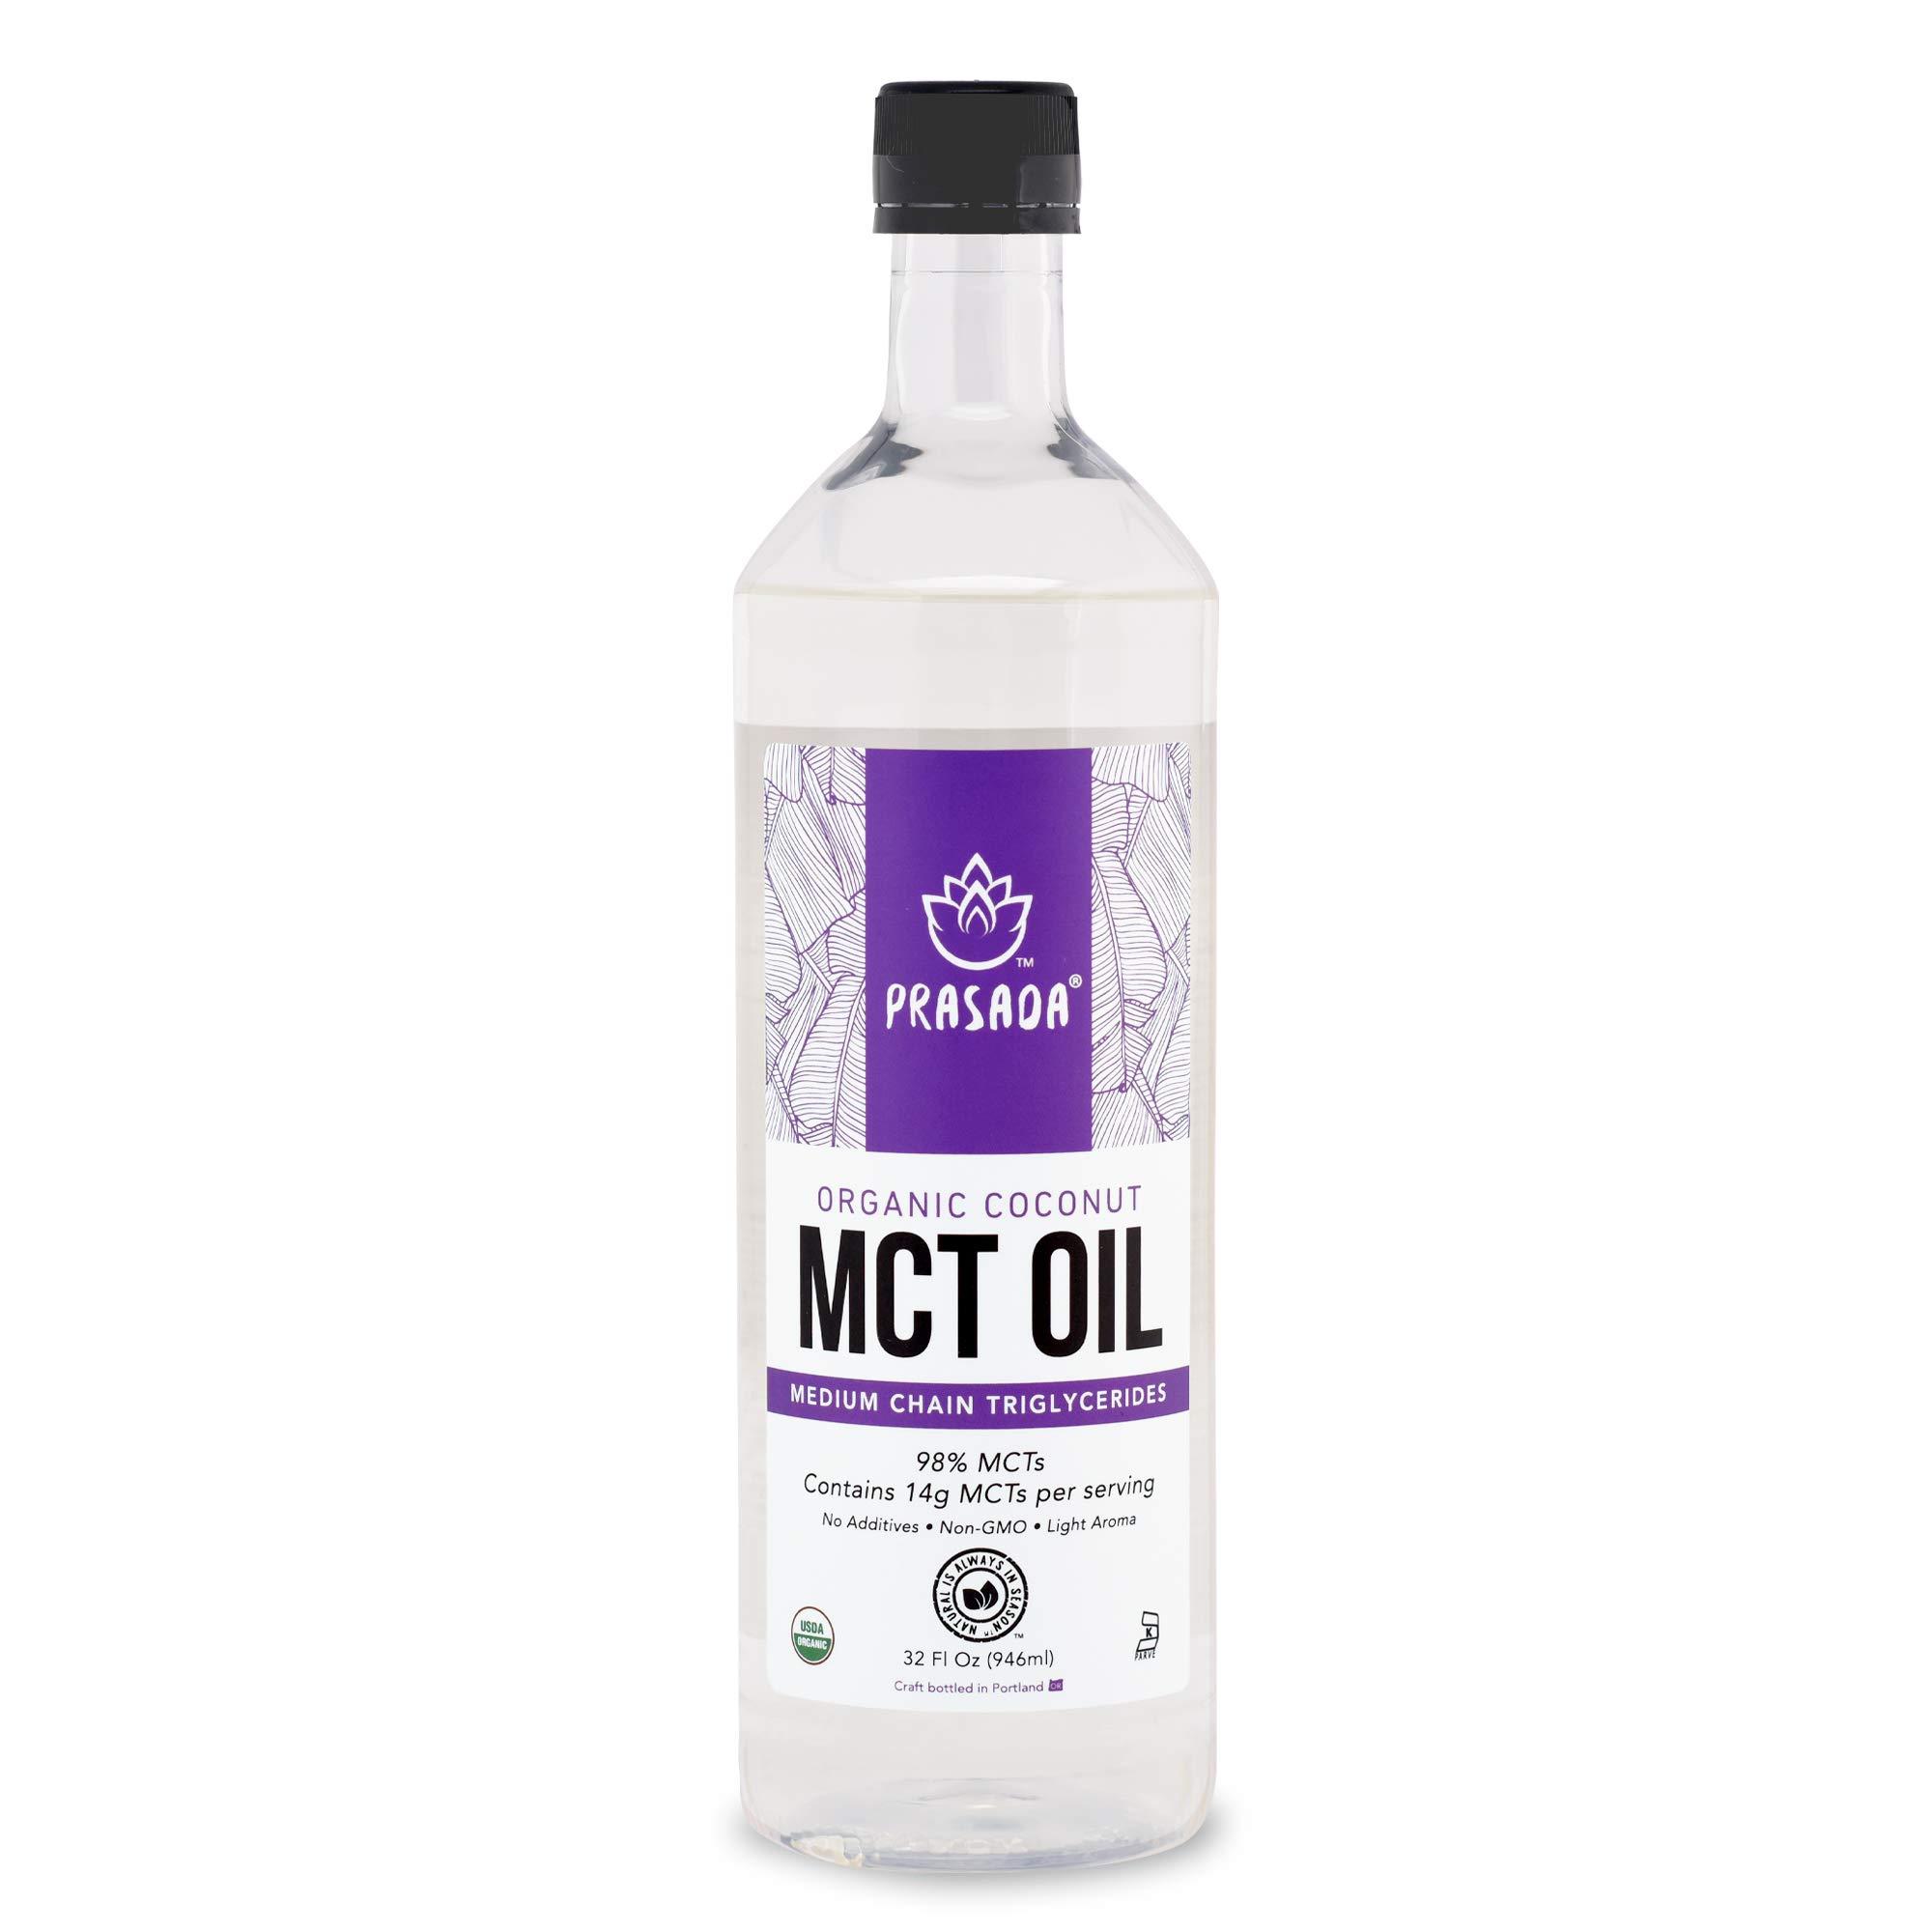 Prasada Organic MCT Coconut Oil (32oz) | 14g MCTs per Serving | USDA Organic, Non-GMO, BPA-Free Food-Grade Plastic Bottle | Keto Friendly | C8: 7.7g, C10: 6.1g by Prasada